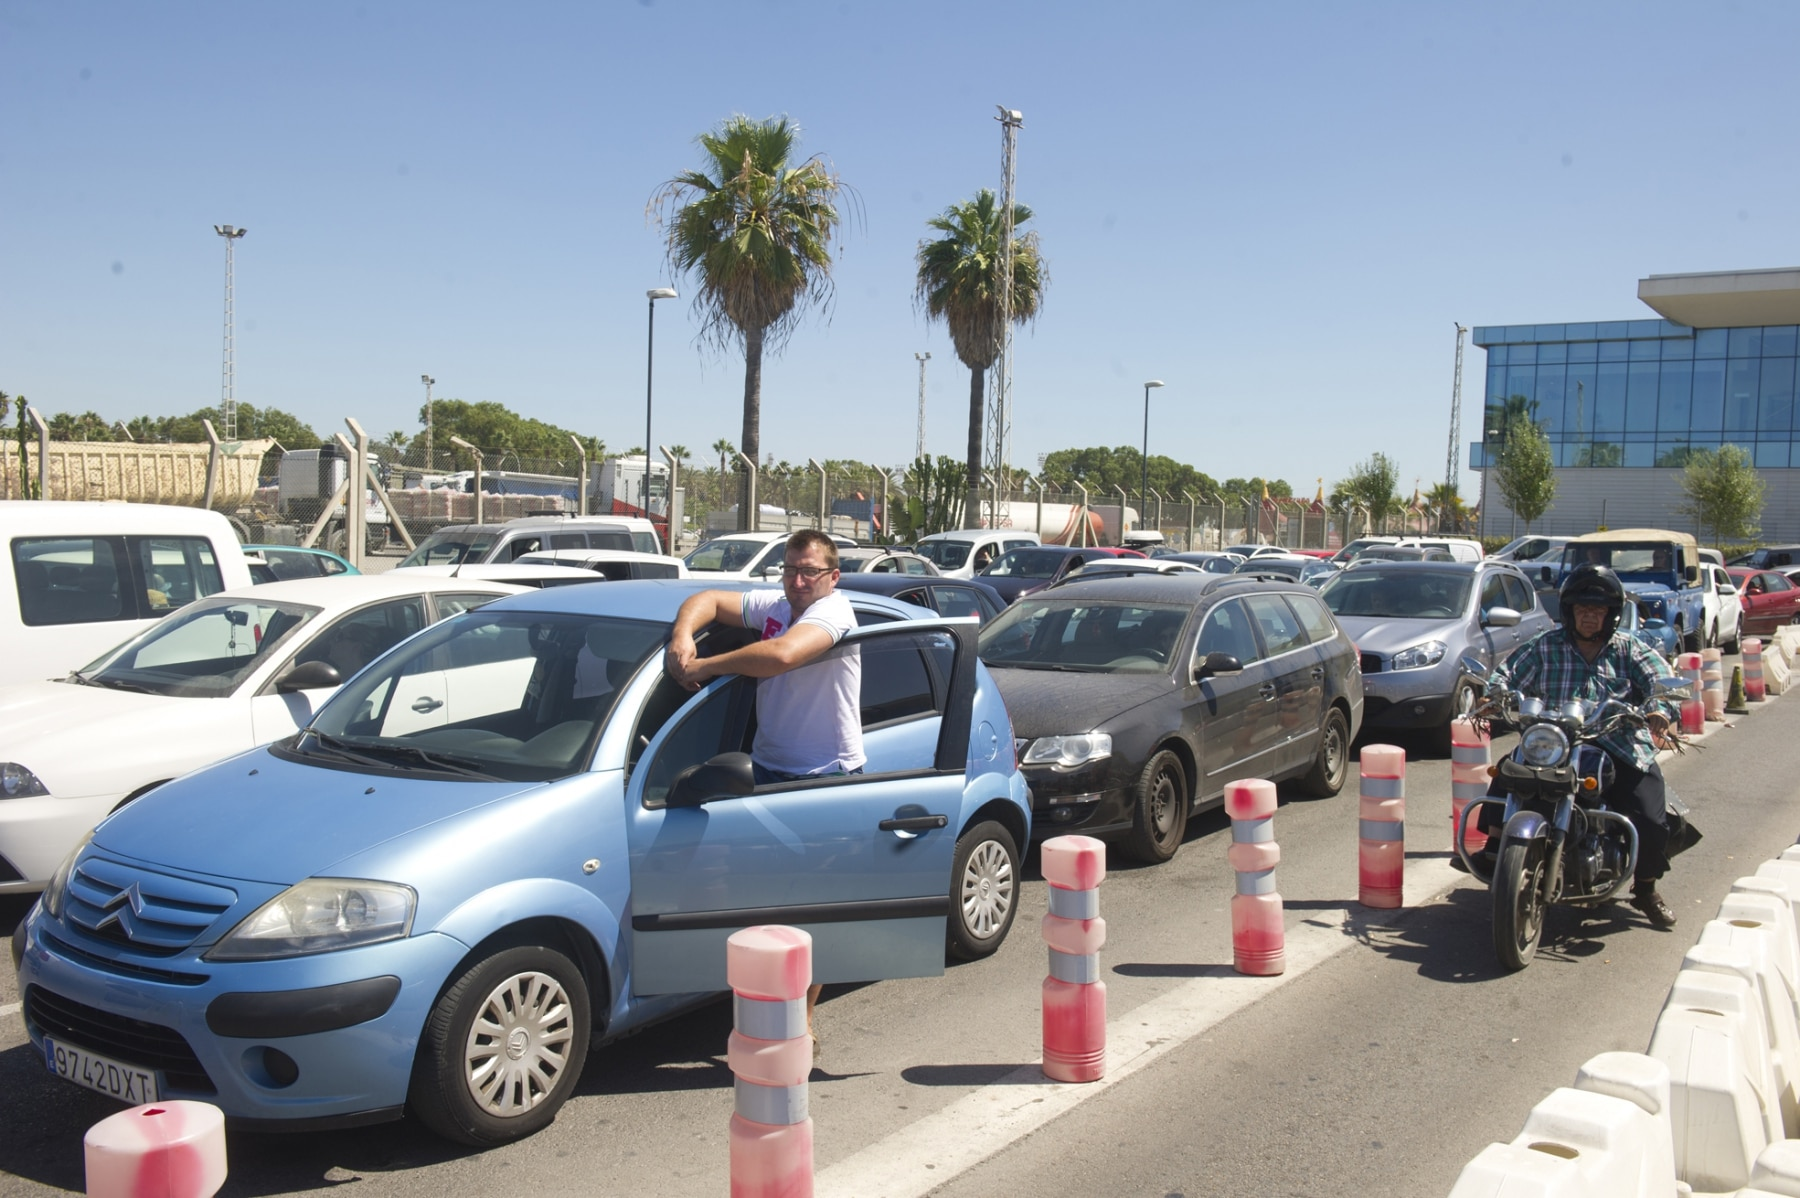 21-agosto-2014-colas-de-entrada-y-salida-de-gibraltar20_14803037769_o